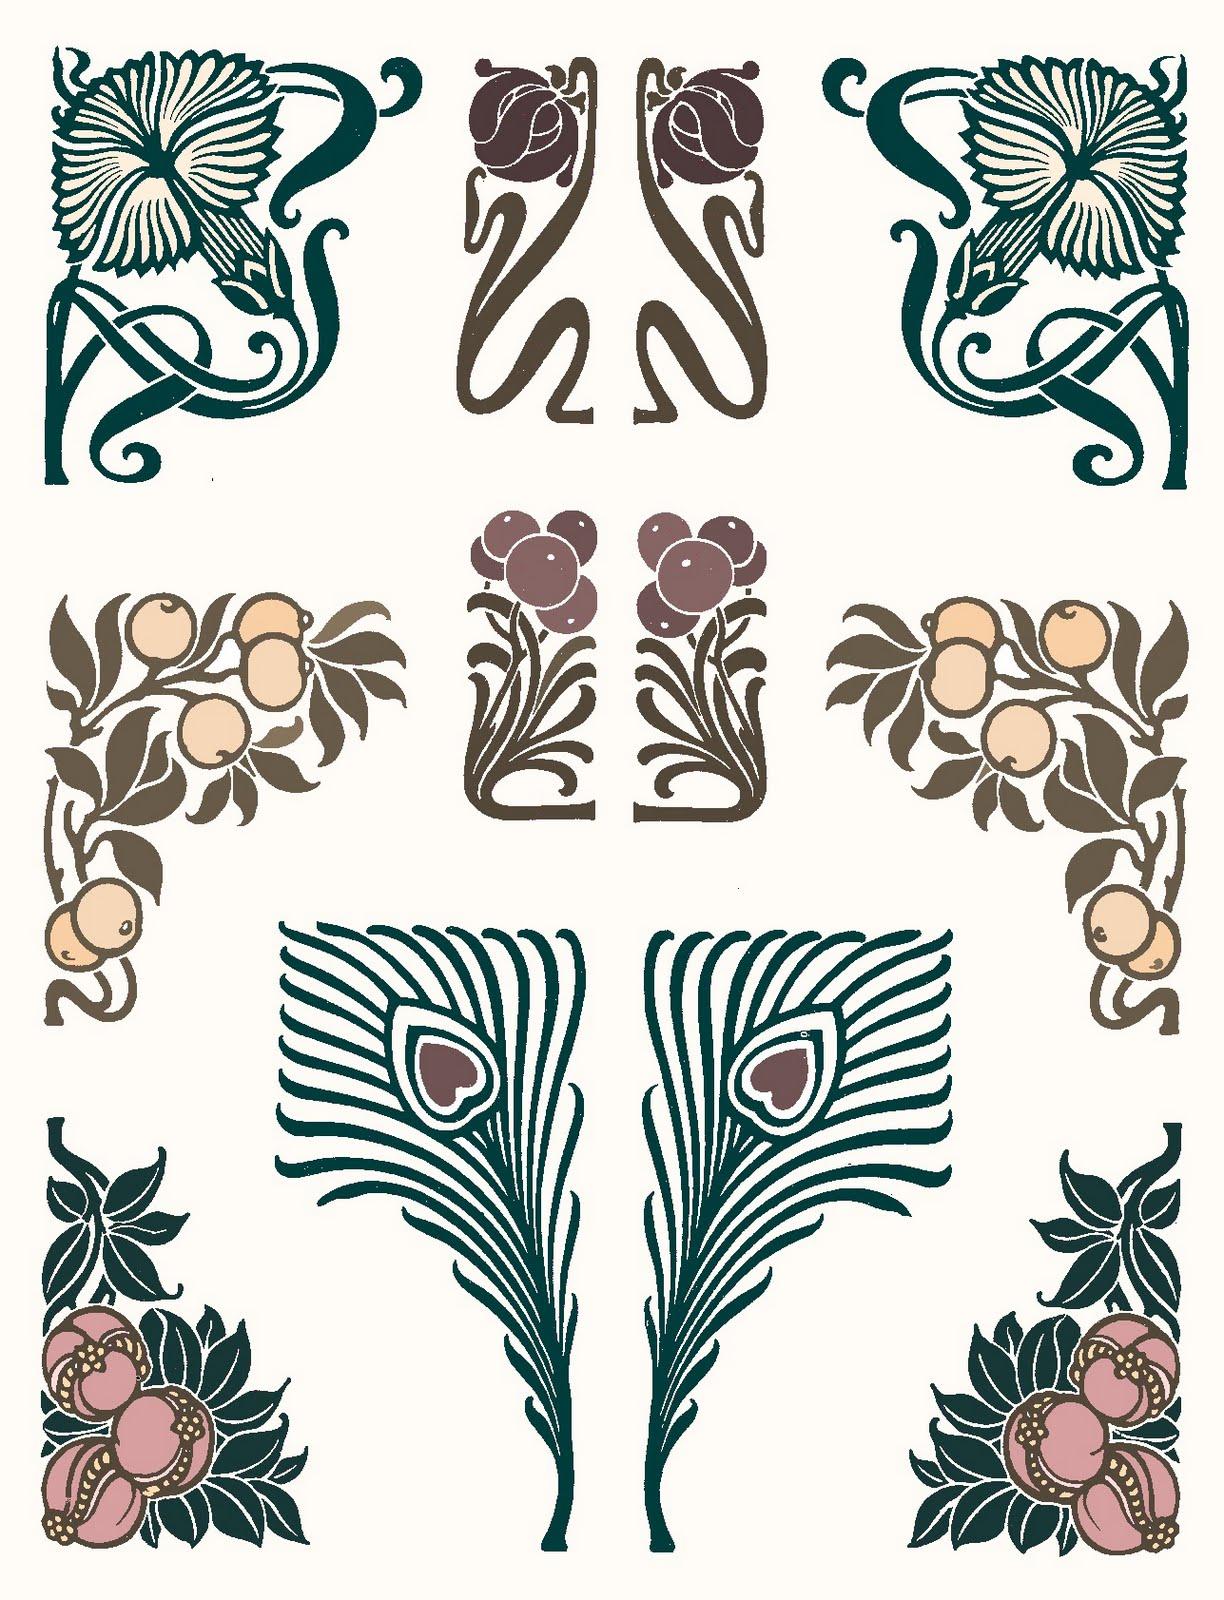 art deco tattoo on pinterest art nouveau tattoo nouveau tattoo and art. Black Bedroom Furniture Sets. Home Design Ideas